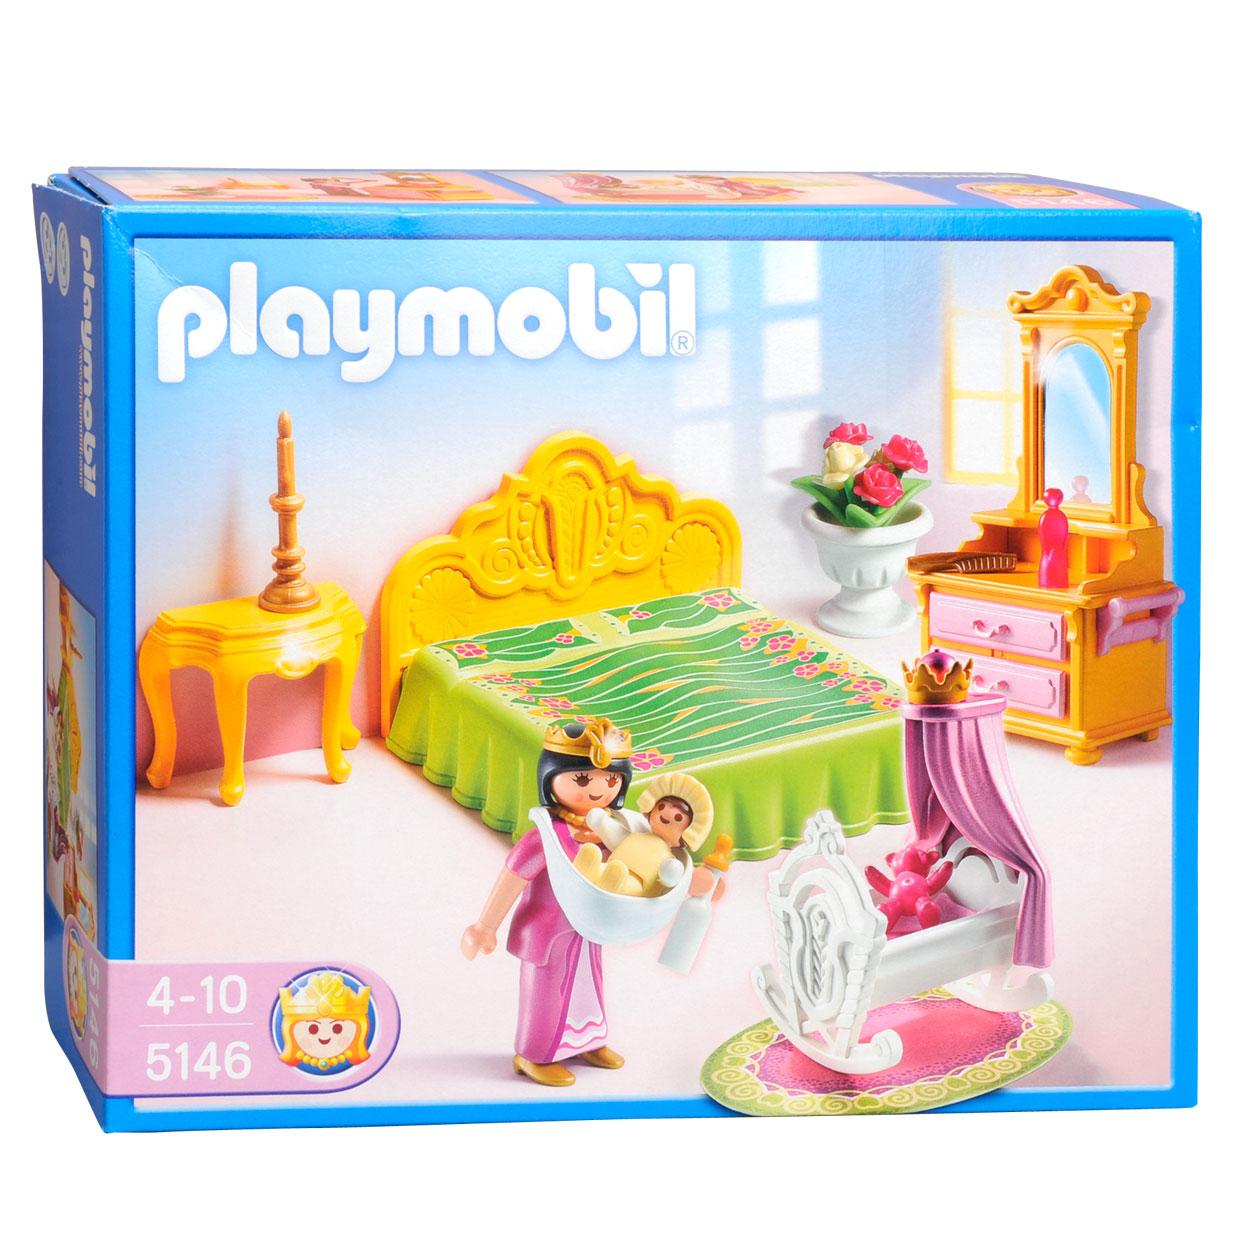 Playmobil 5146 Slaapkamer met Wieg online kopen   Lobbes nl